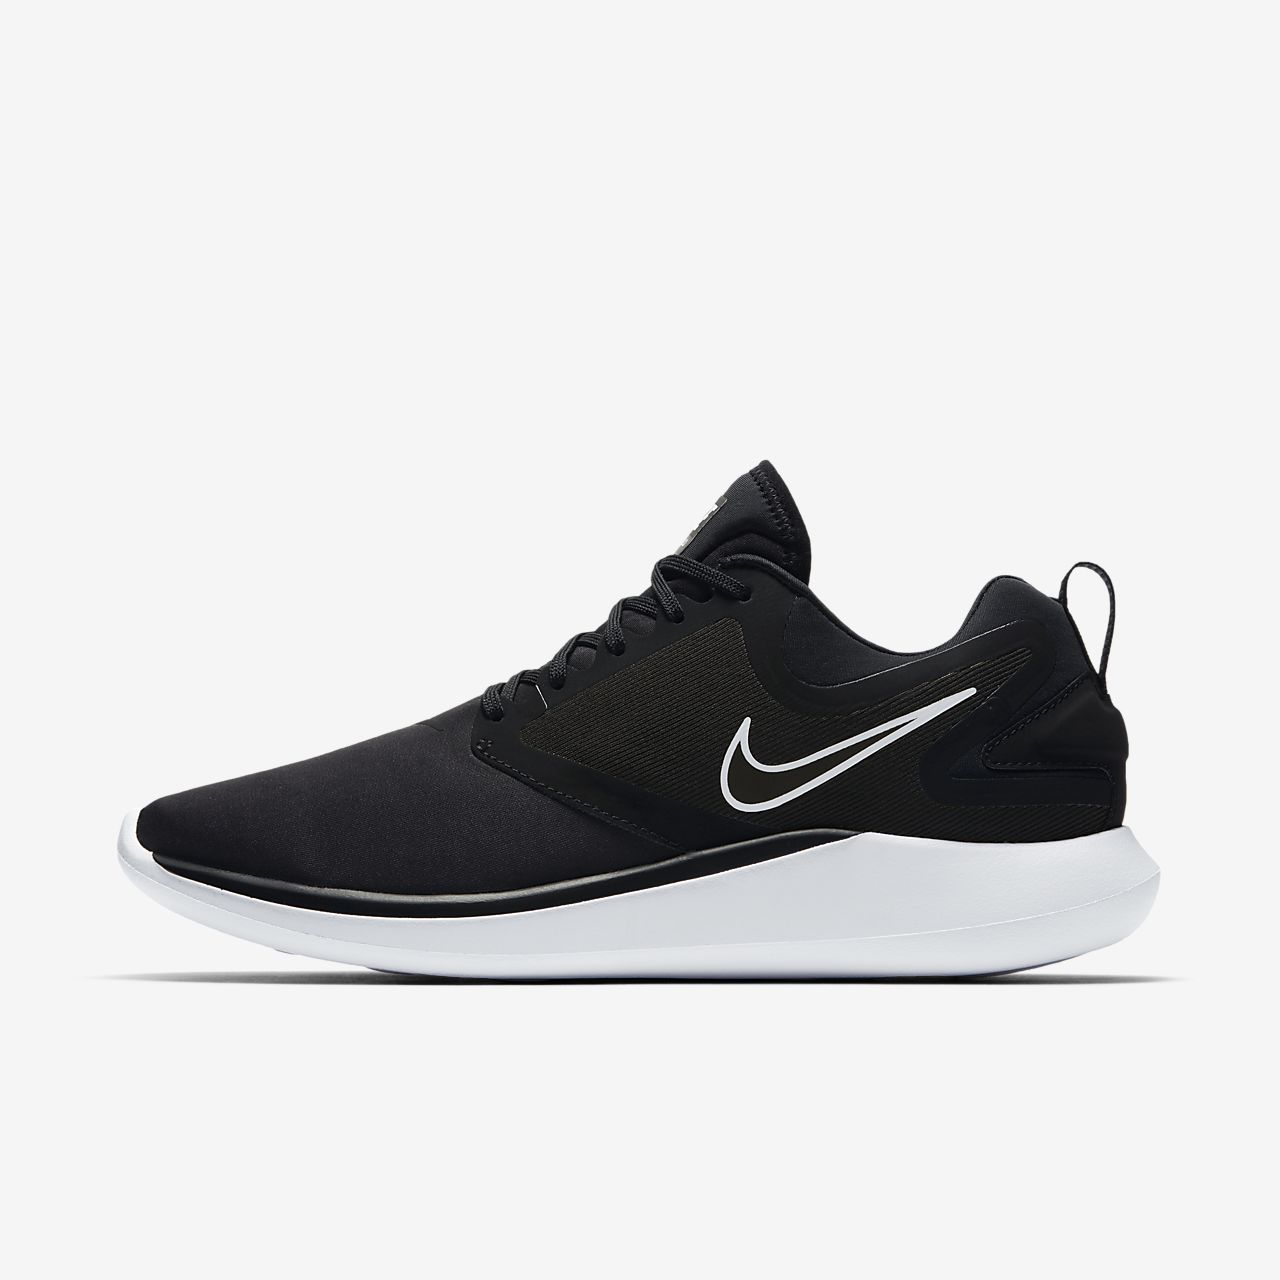 Men's Nike LunarSolo Running Shoe